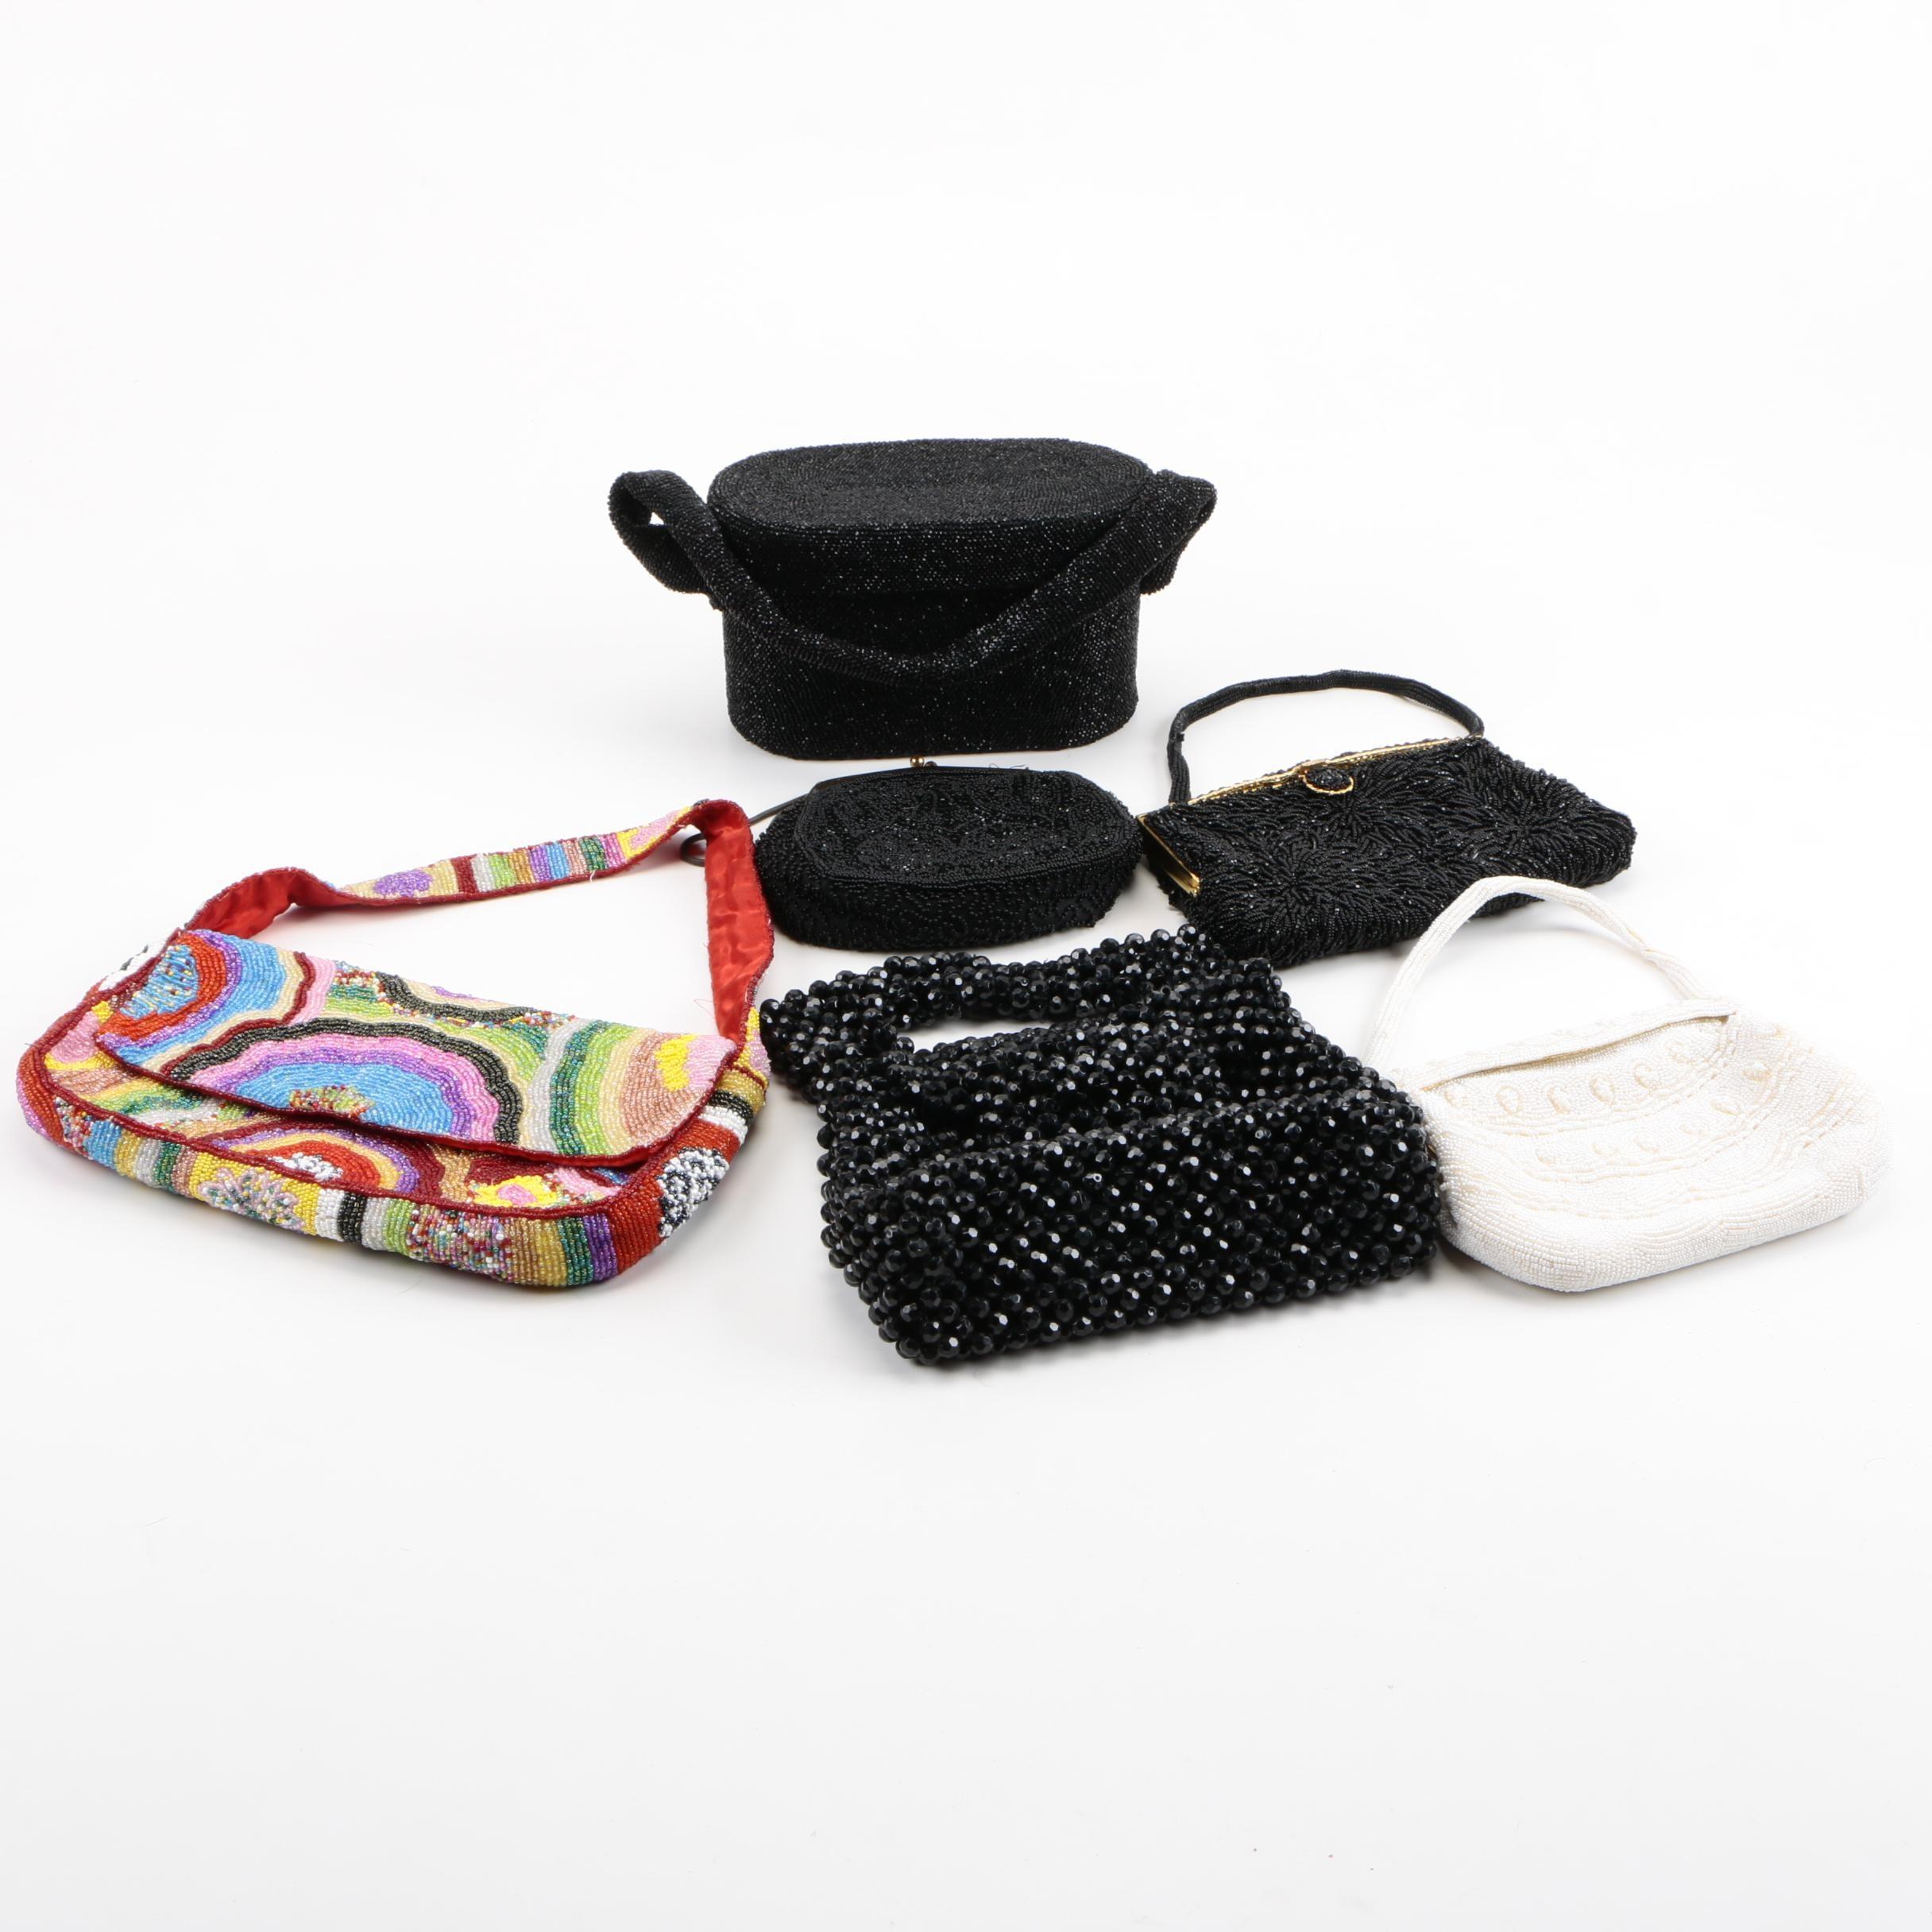 Grouping of Beaded Handbags